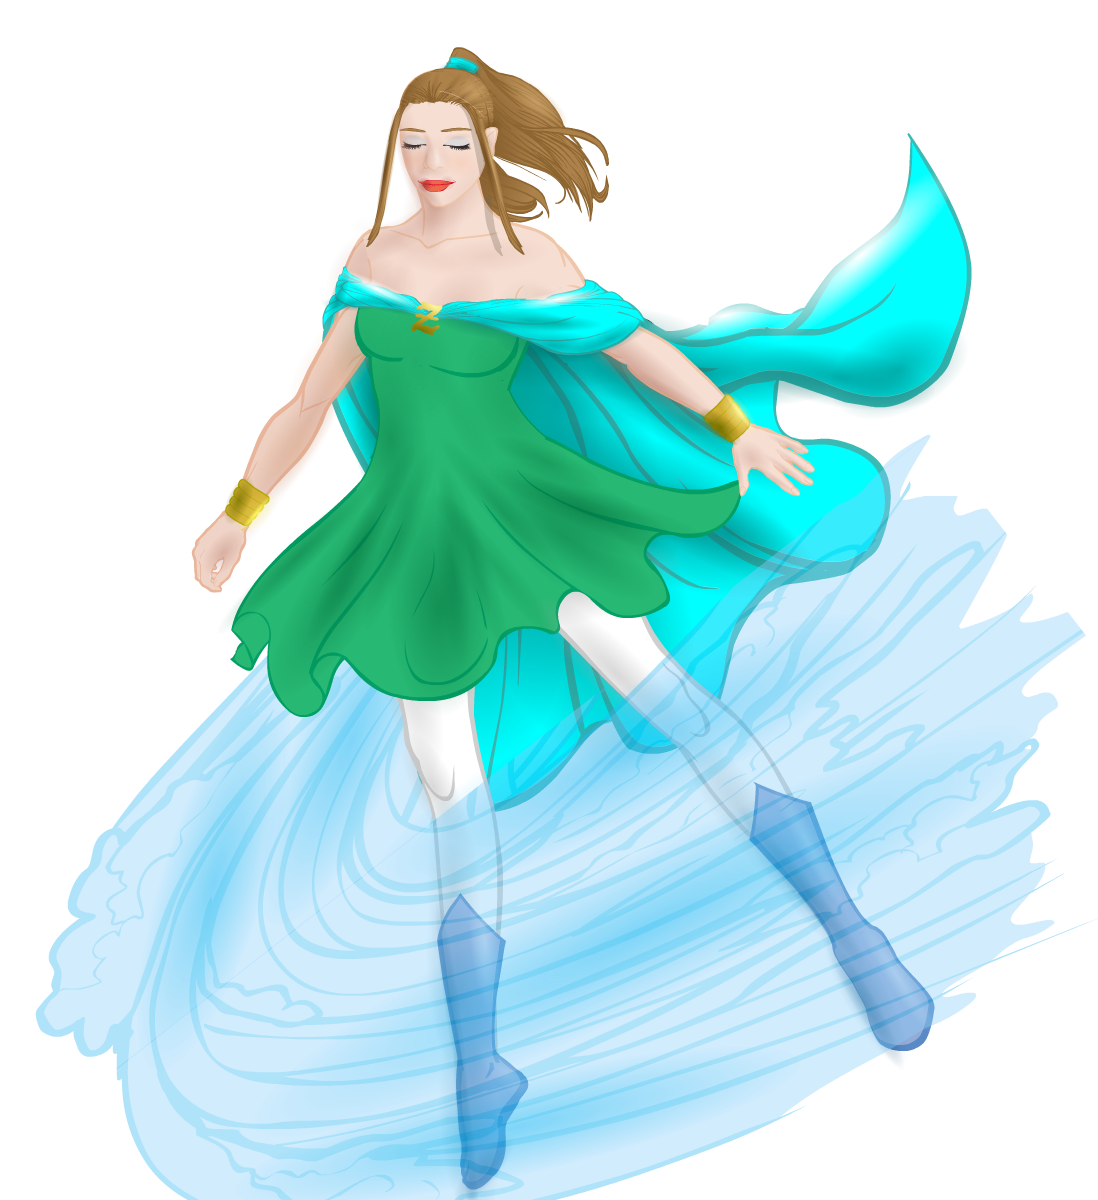 Linea24-Zephyr-Superheroes